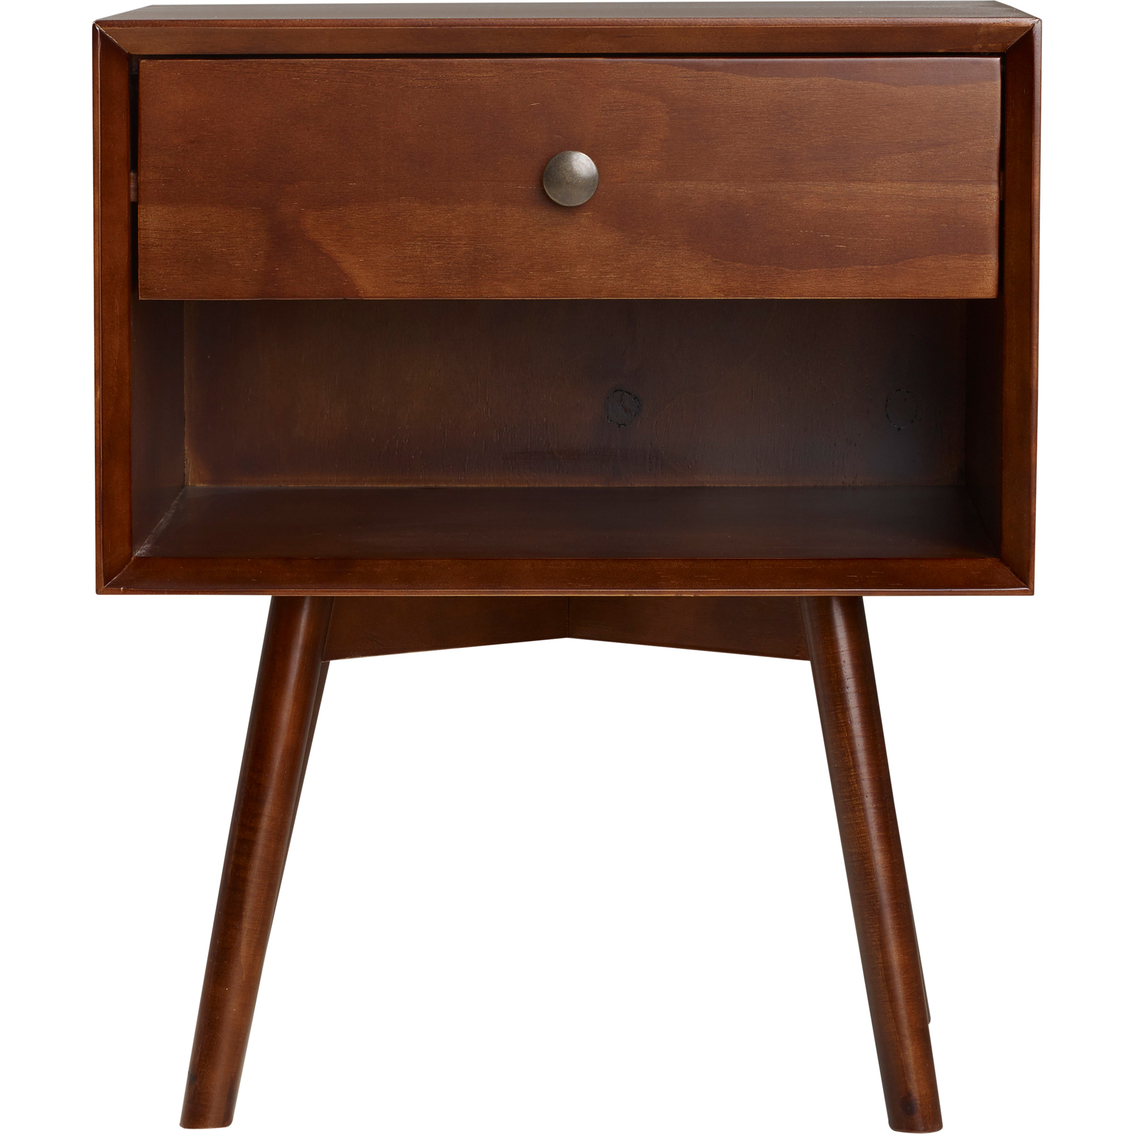 Walker Edison Mid Century One Drawer Solid Wood Nightstand